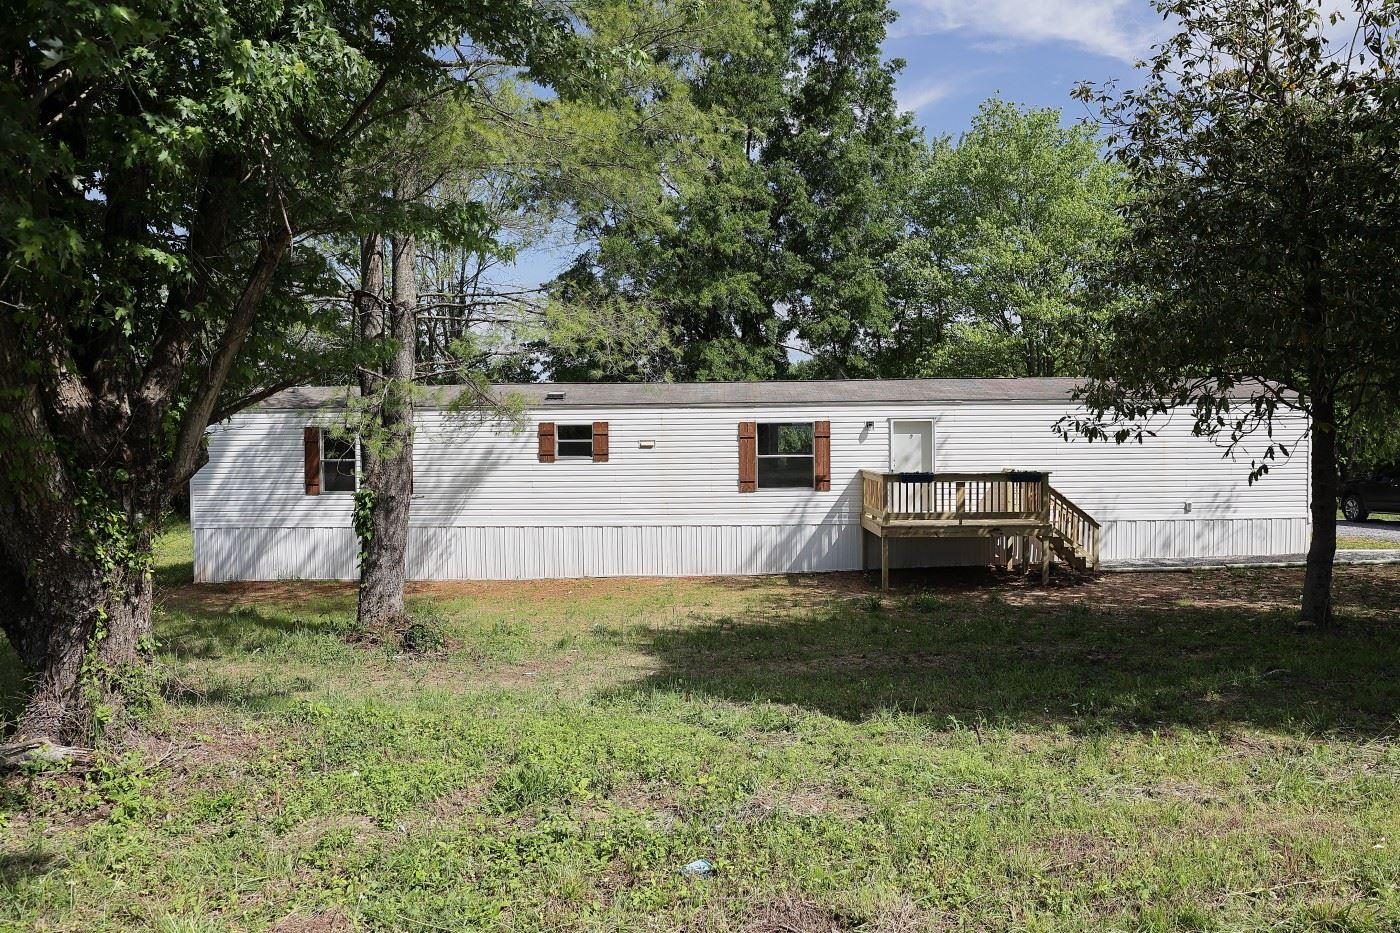 1305 Capshaw Rd, Smithville, TN 37110 - MLS#: 2253416